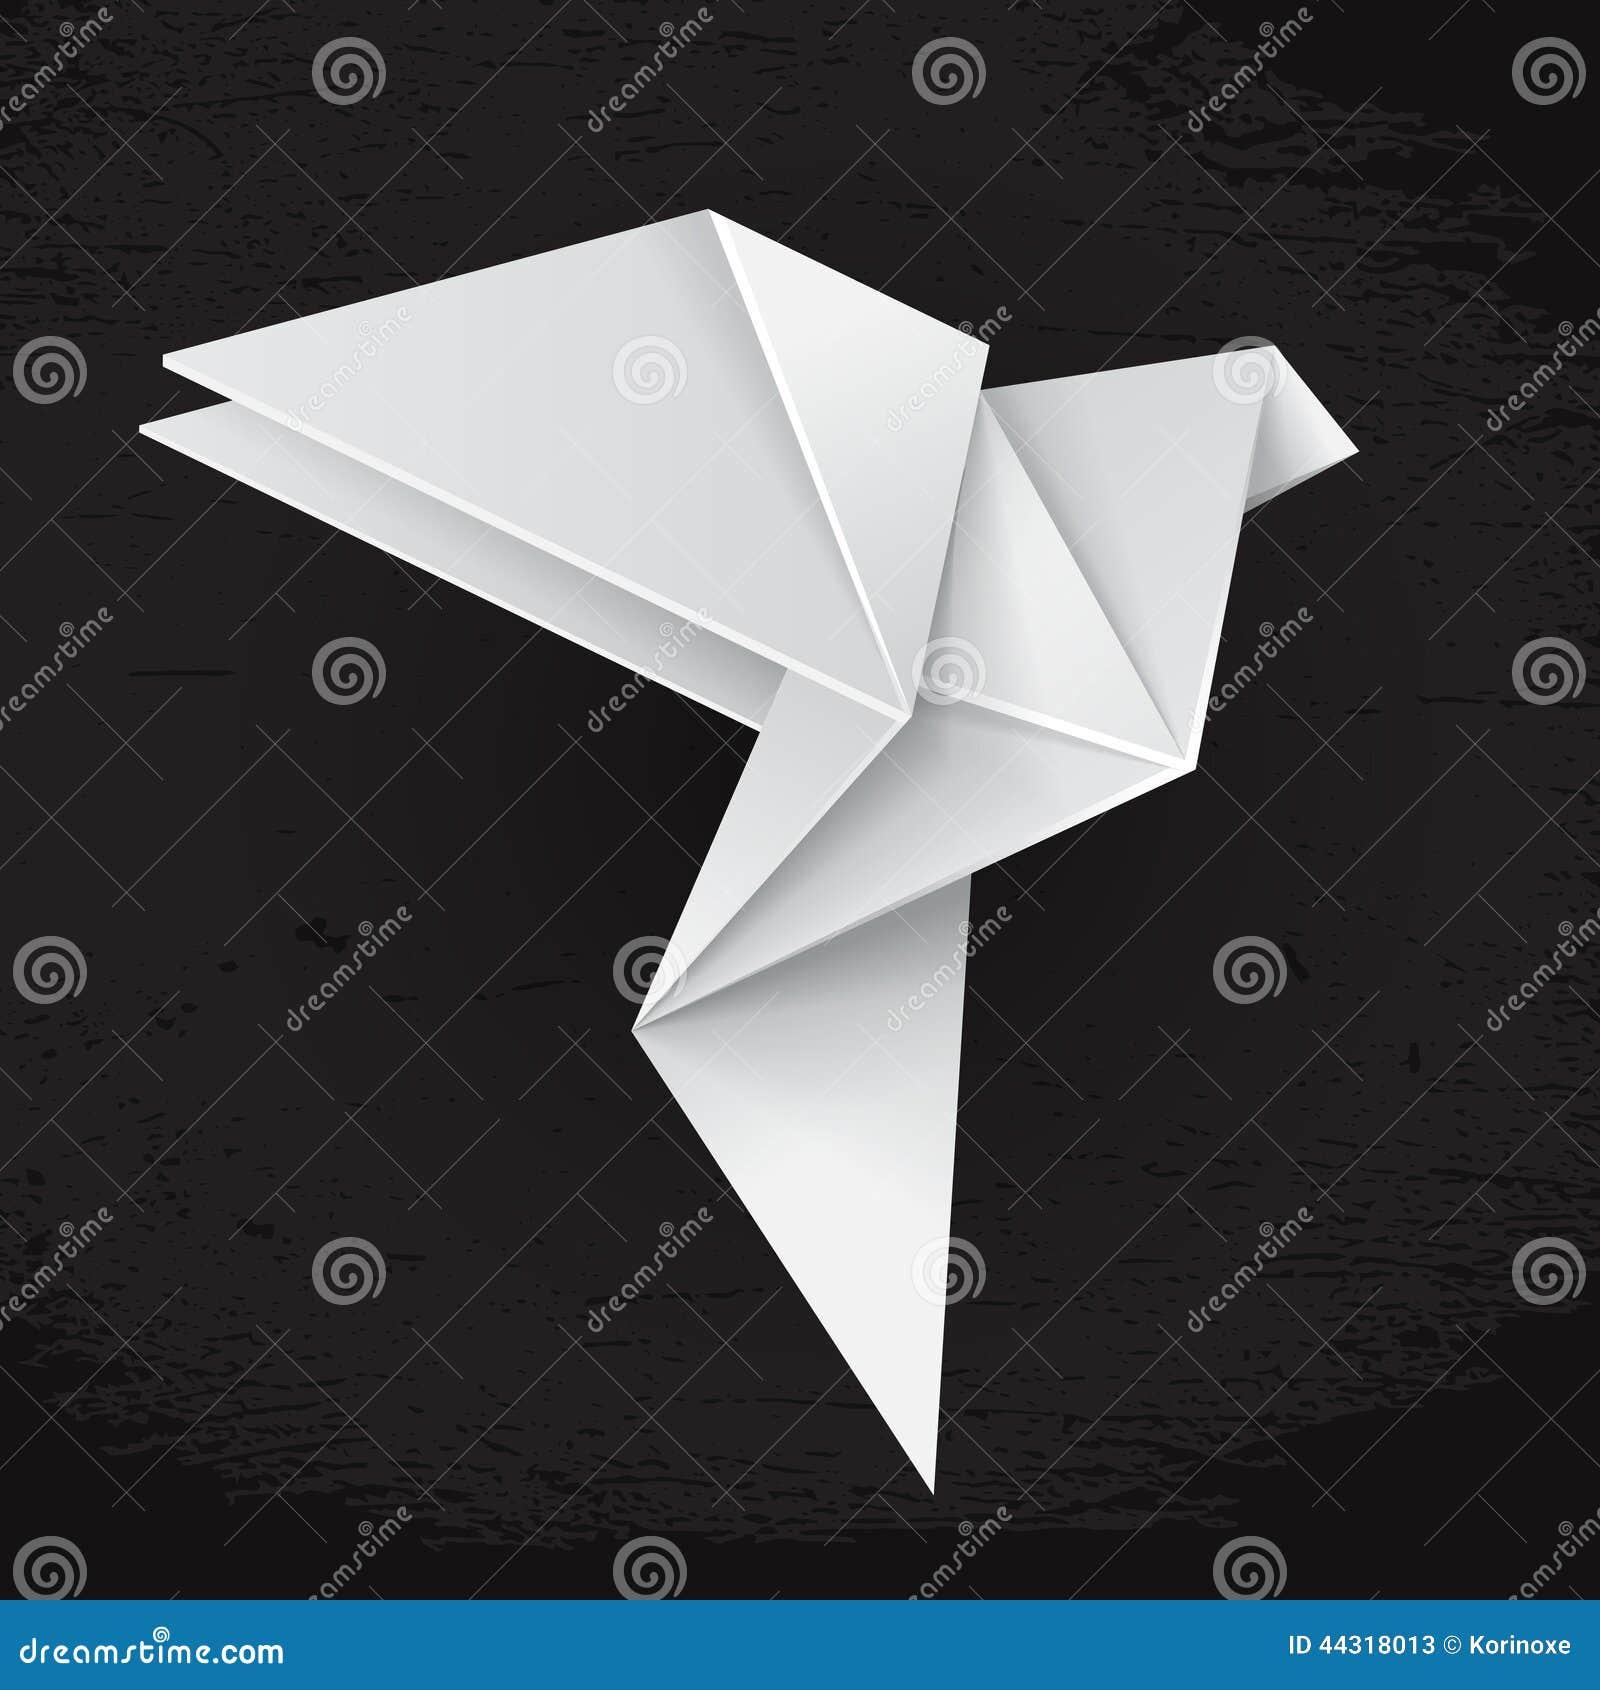 White Origami Dove Stock Vector - Image: 44318013 - photo#20